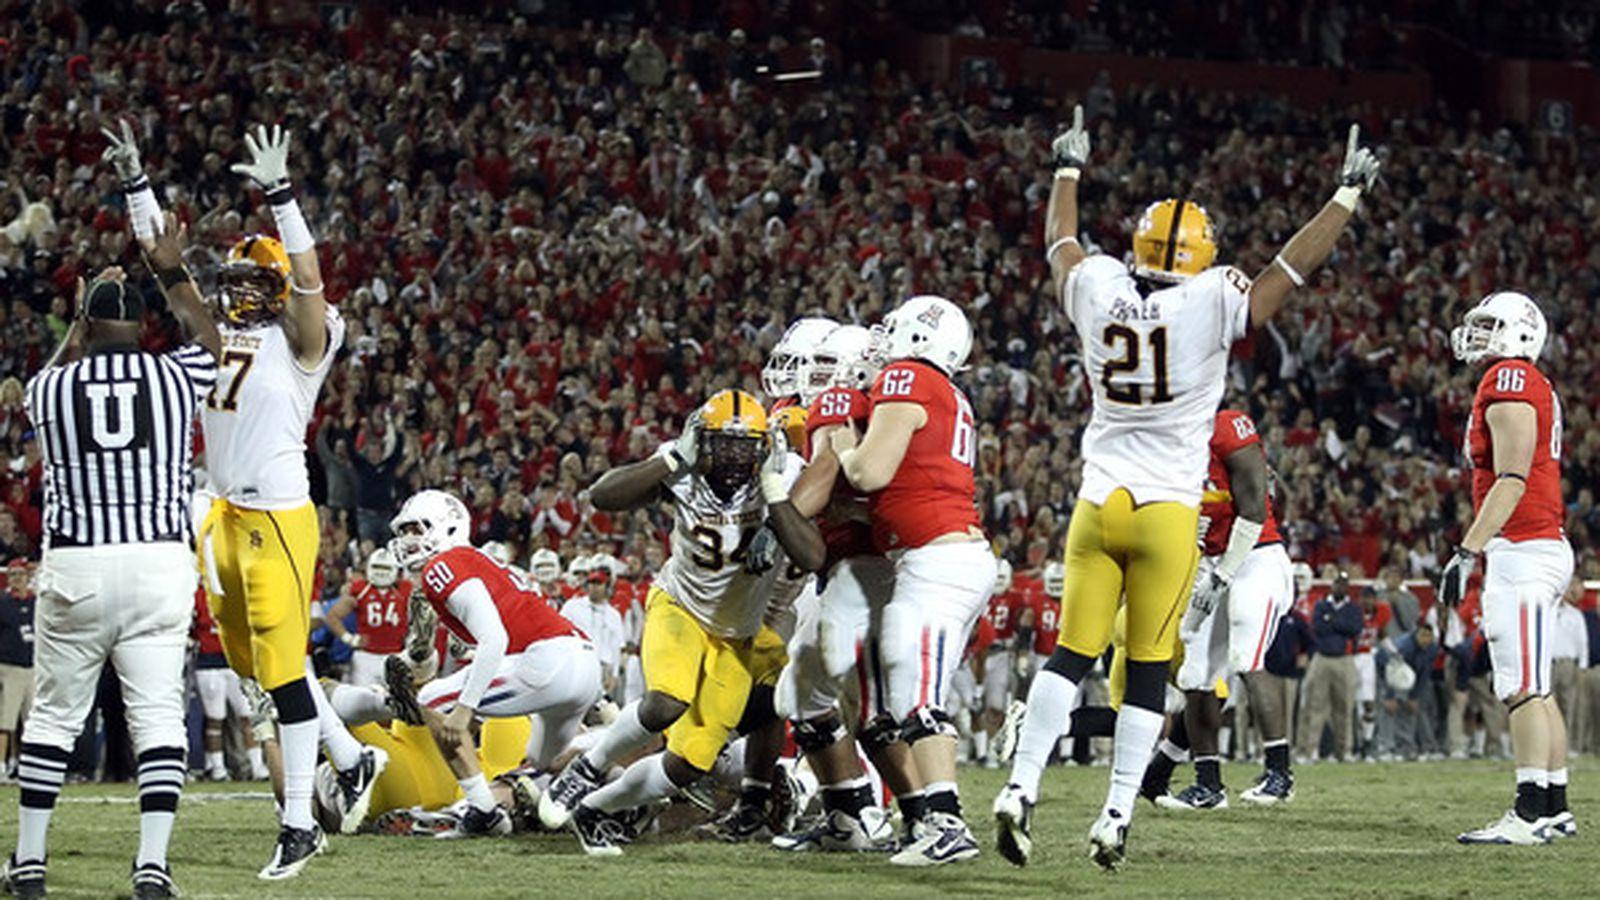 ASU Beats UofA: Which Win Was Bigger, Football In 2010 Or ...